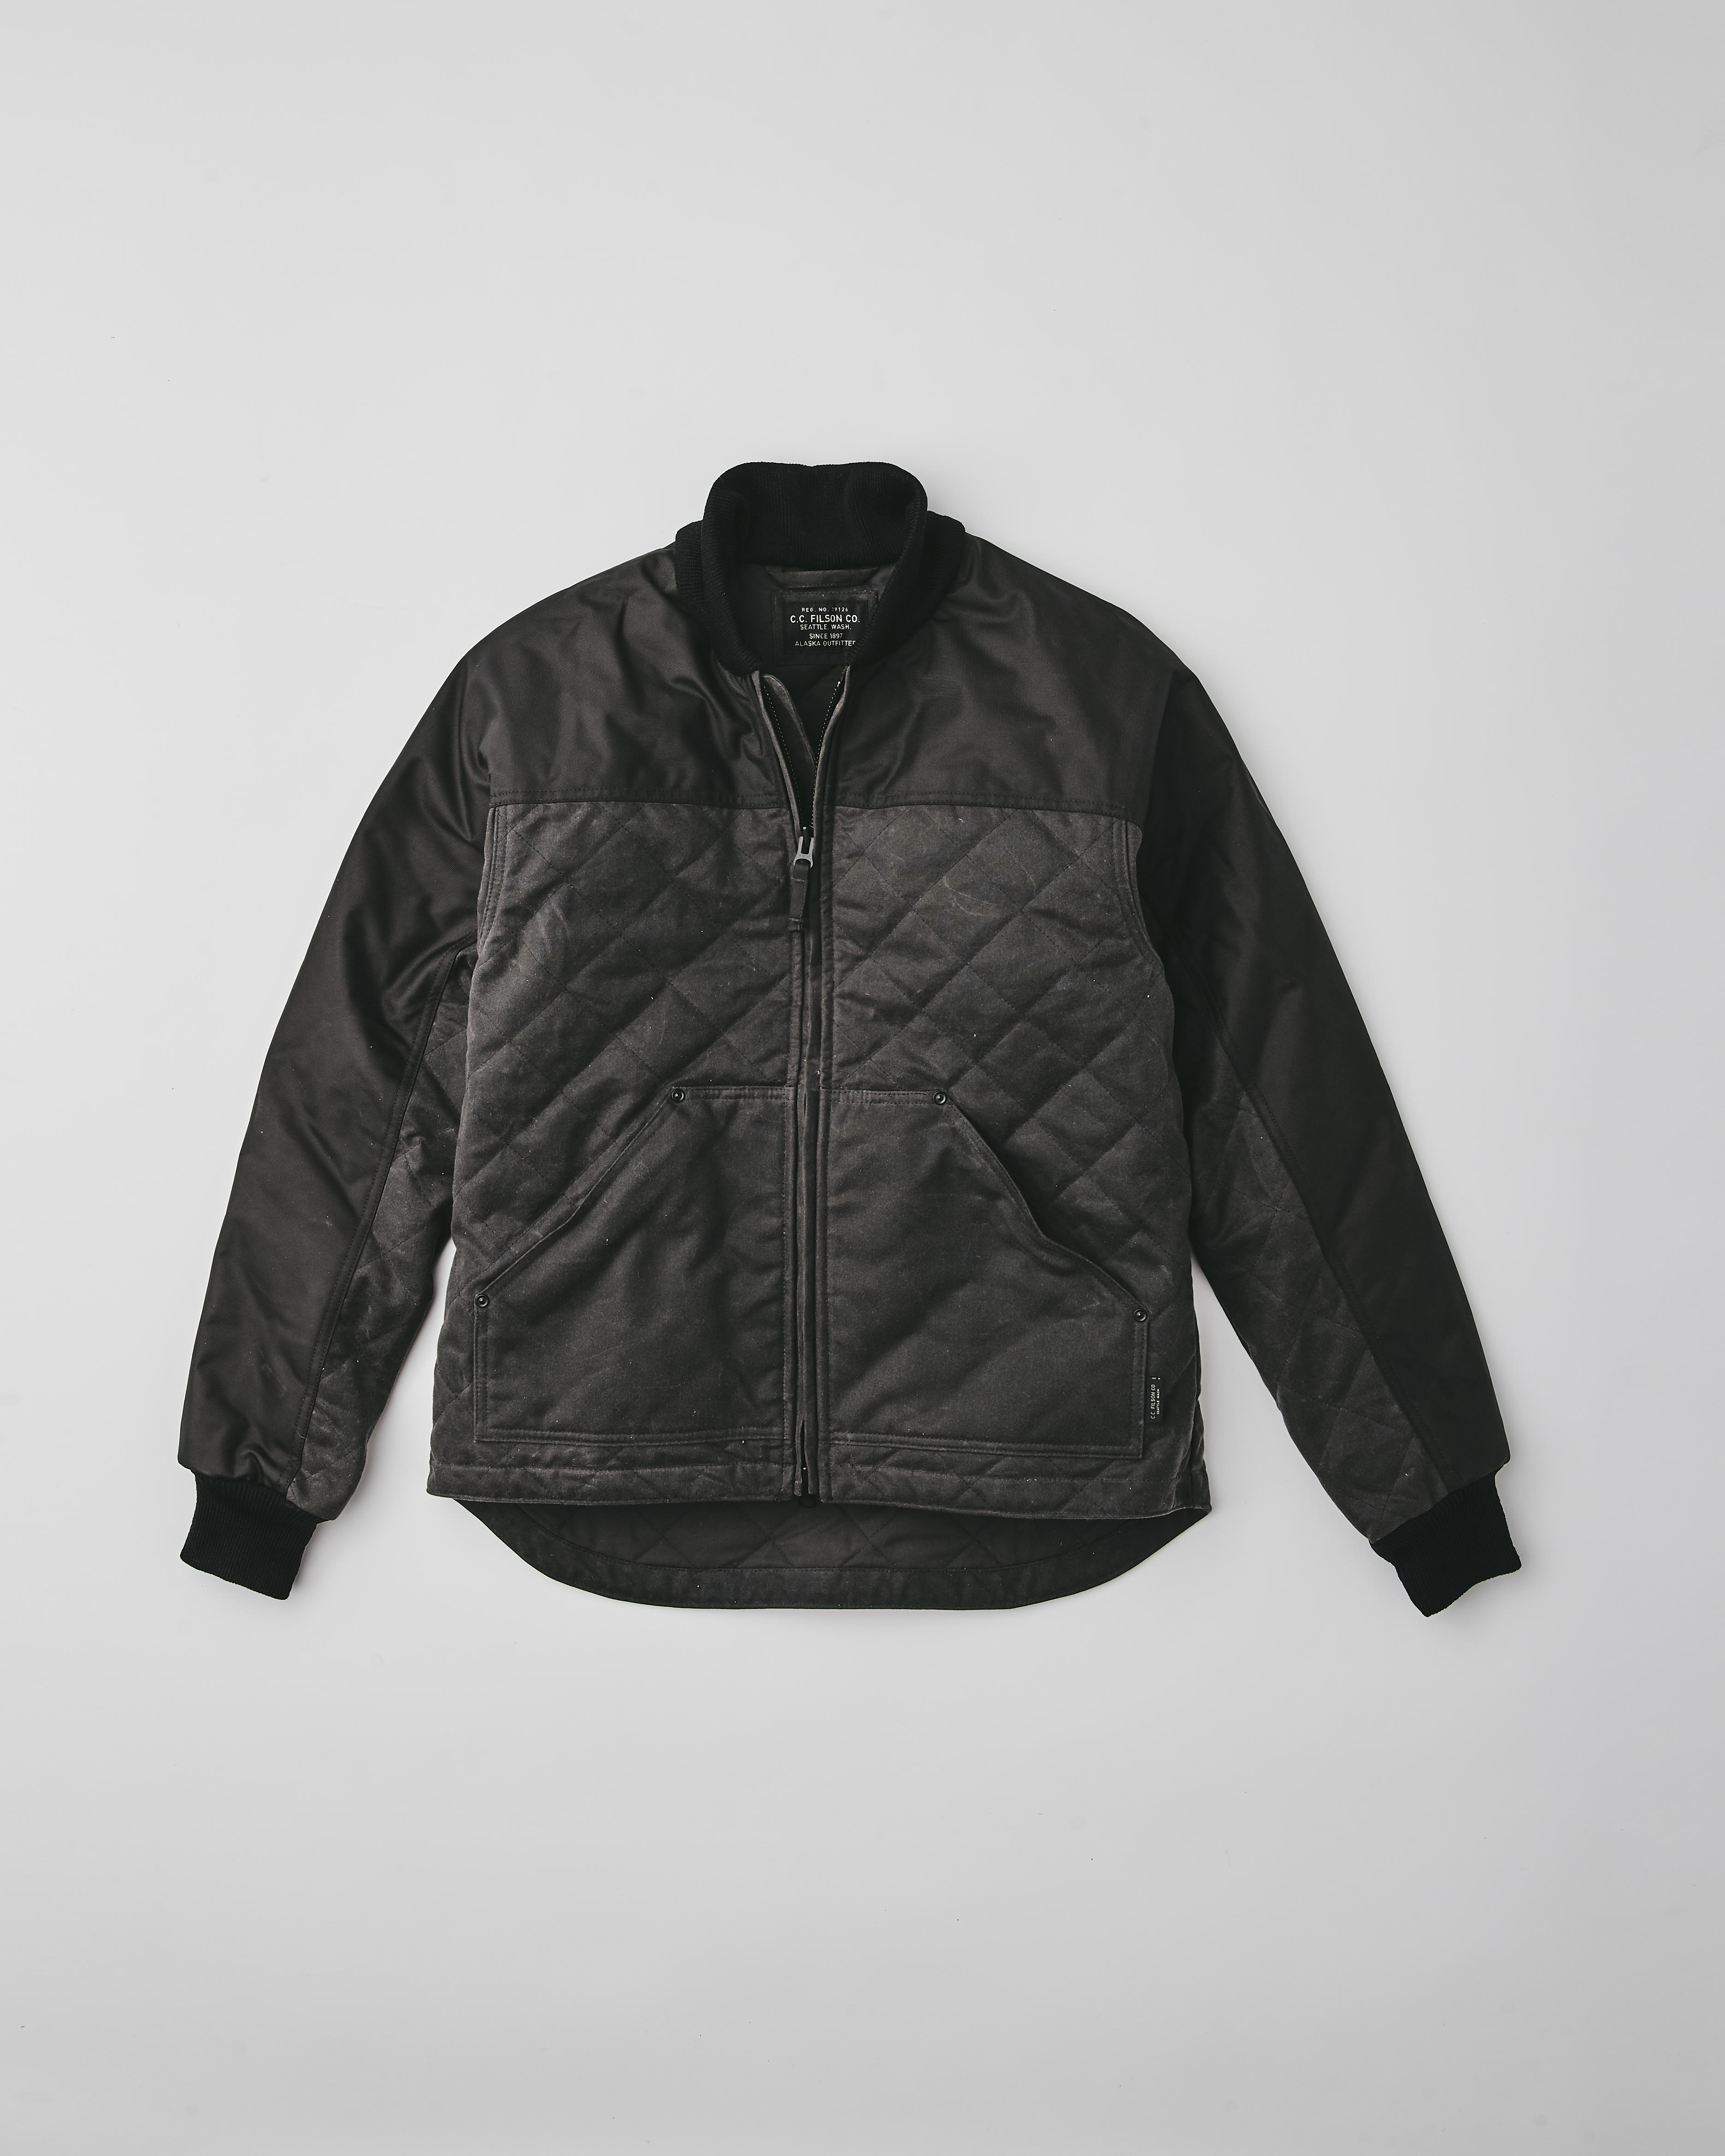 Filson Alcan jacket